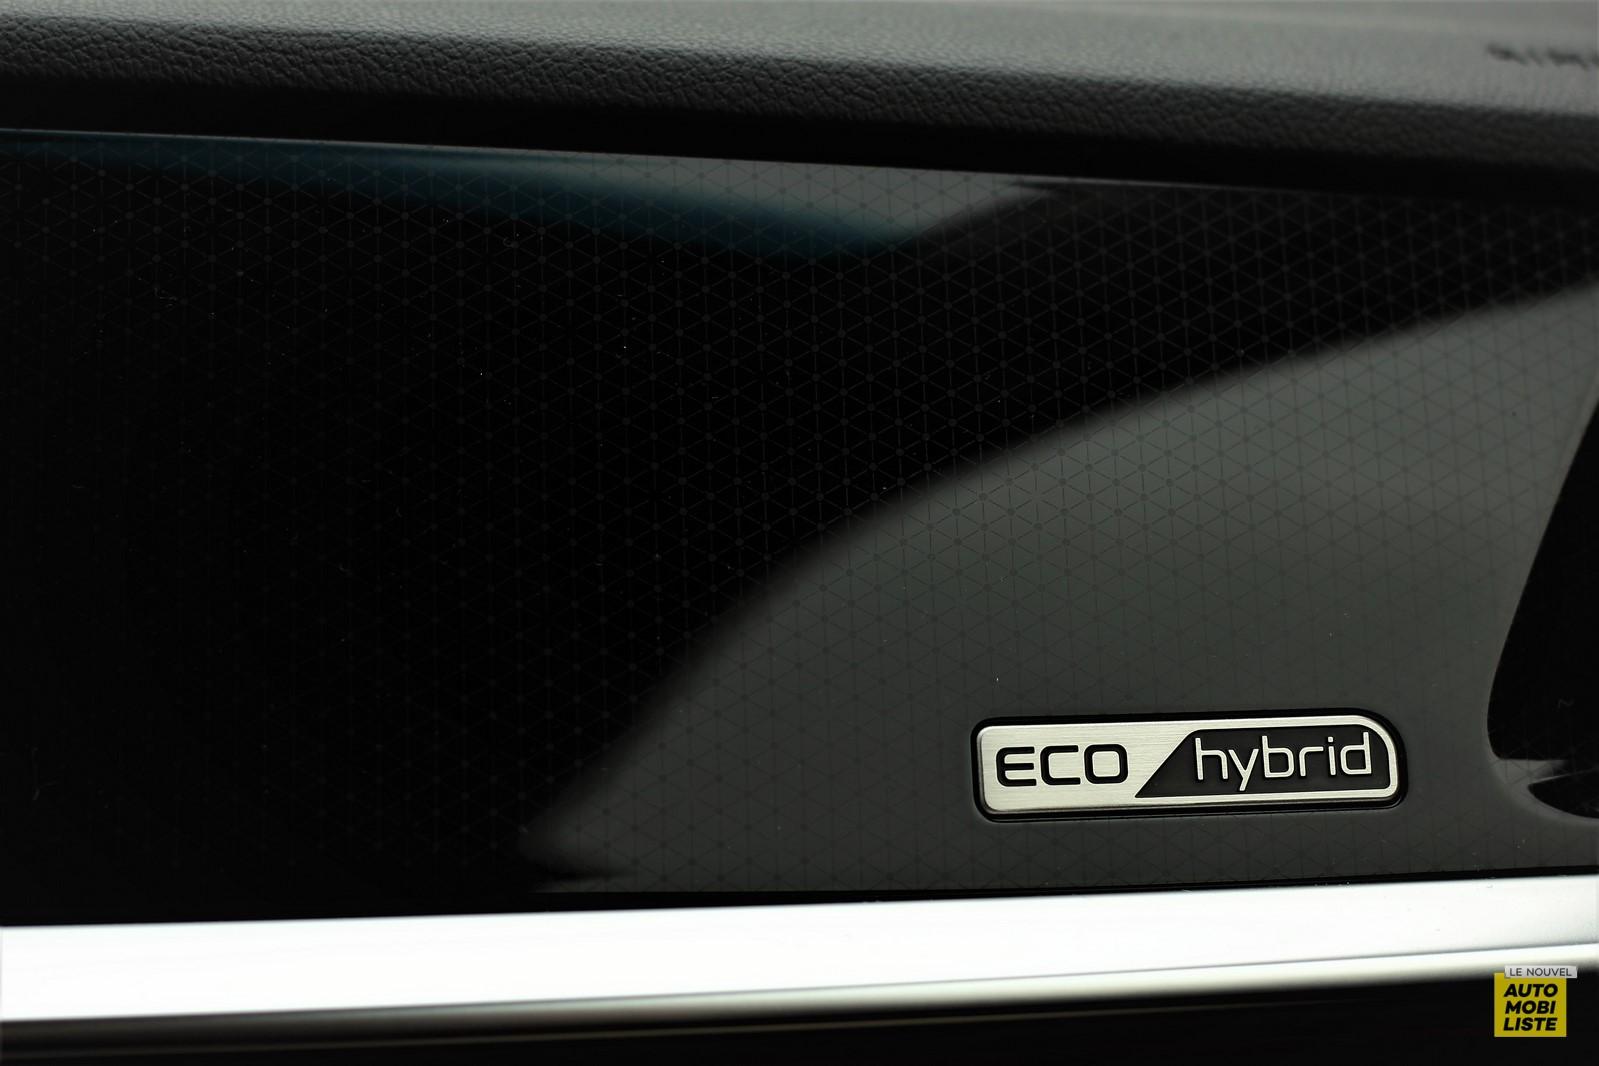 Kia Niro hybrid LNA Thibaut Dumoulin 31